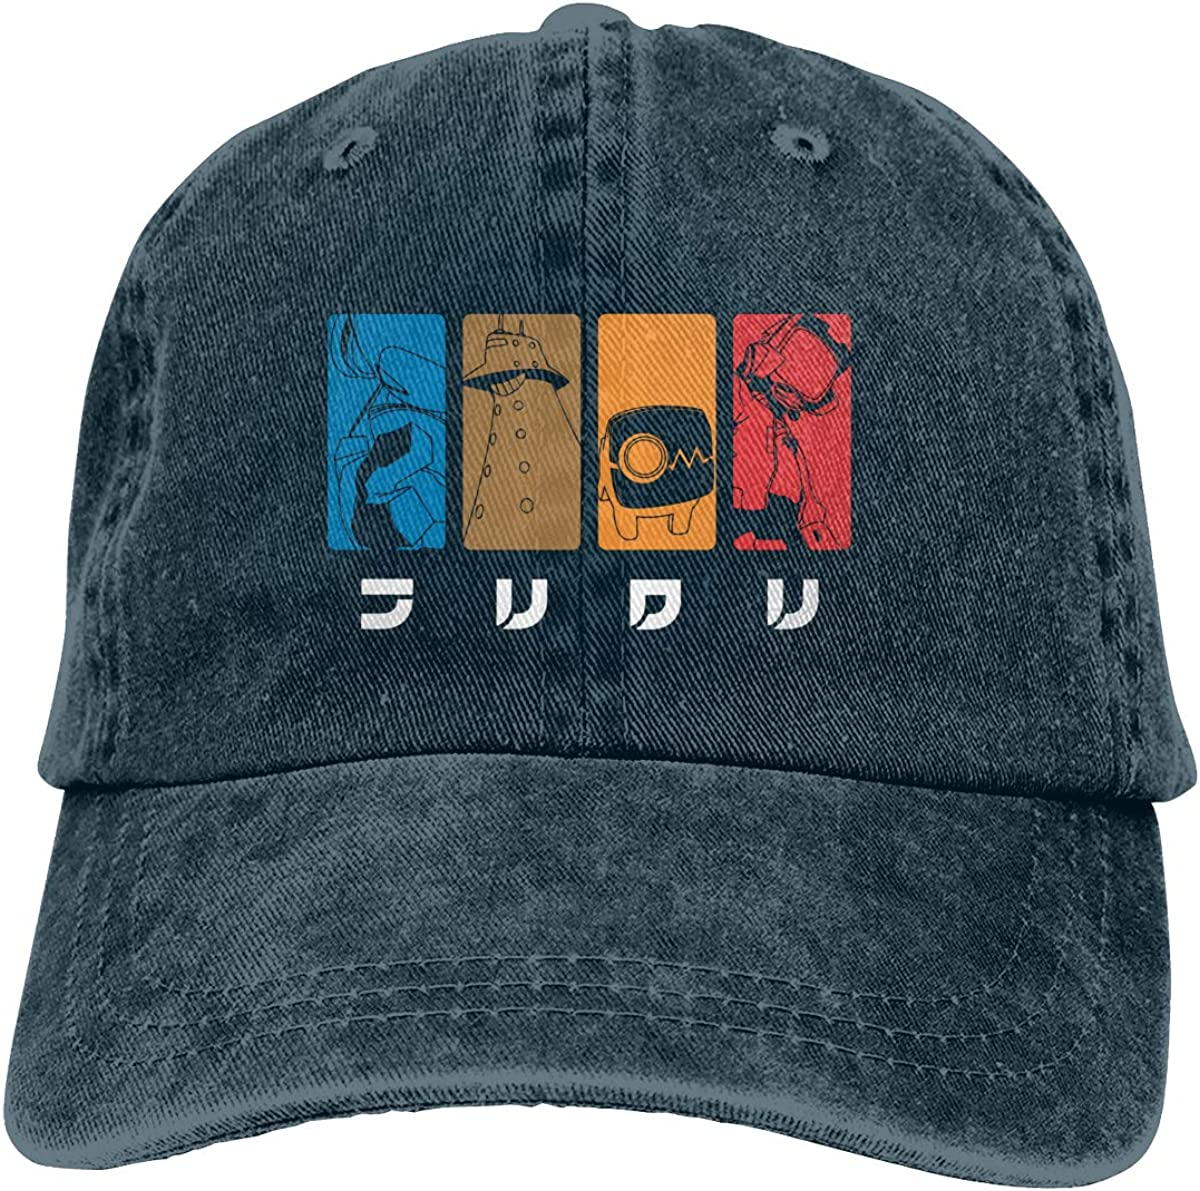 BKOGAL Unisex Adult Adjustable Cotton Denim Baseball Cap Anime The FLCL Snapback Hat